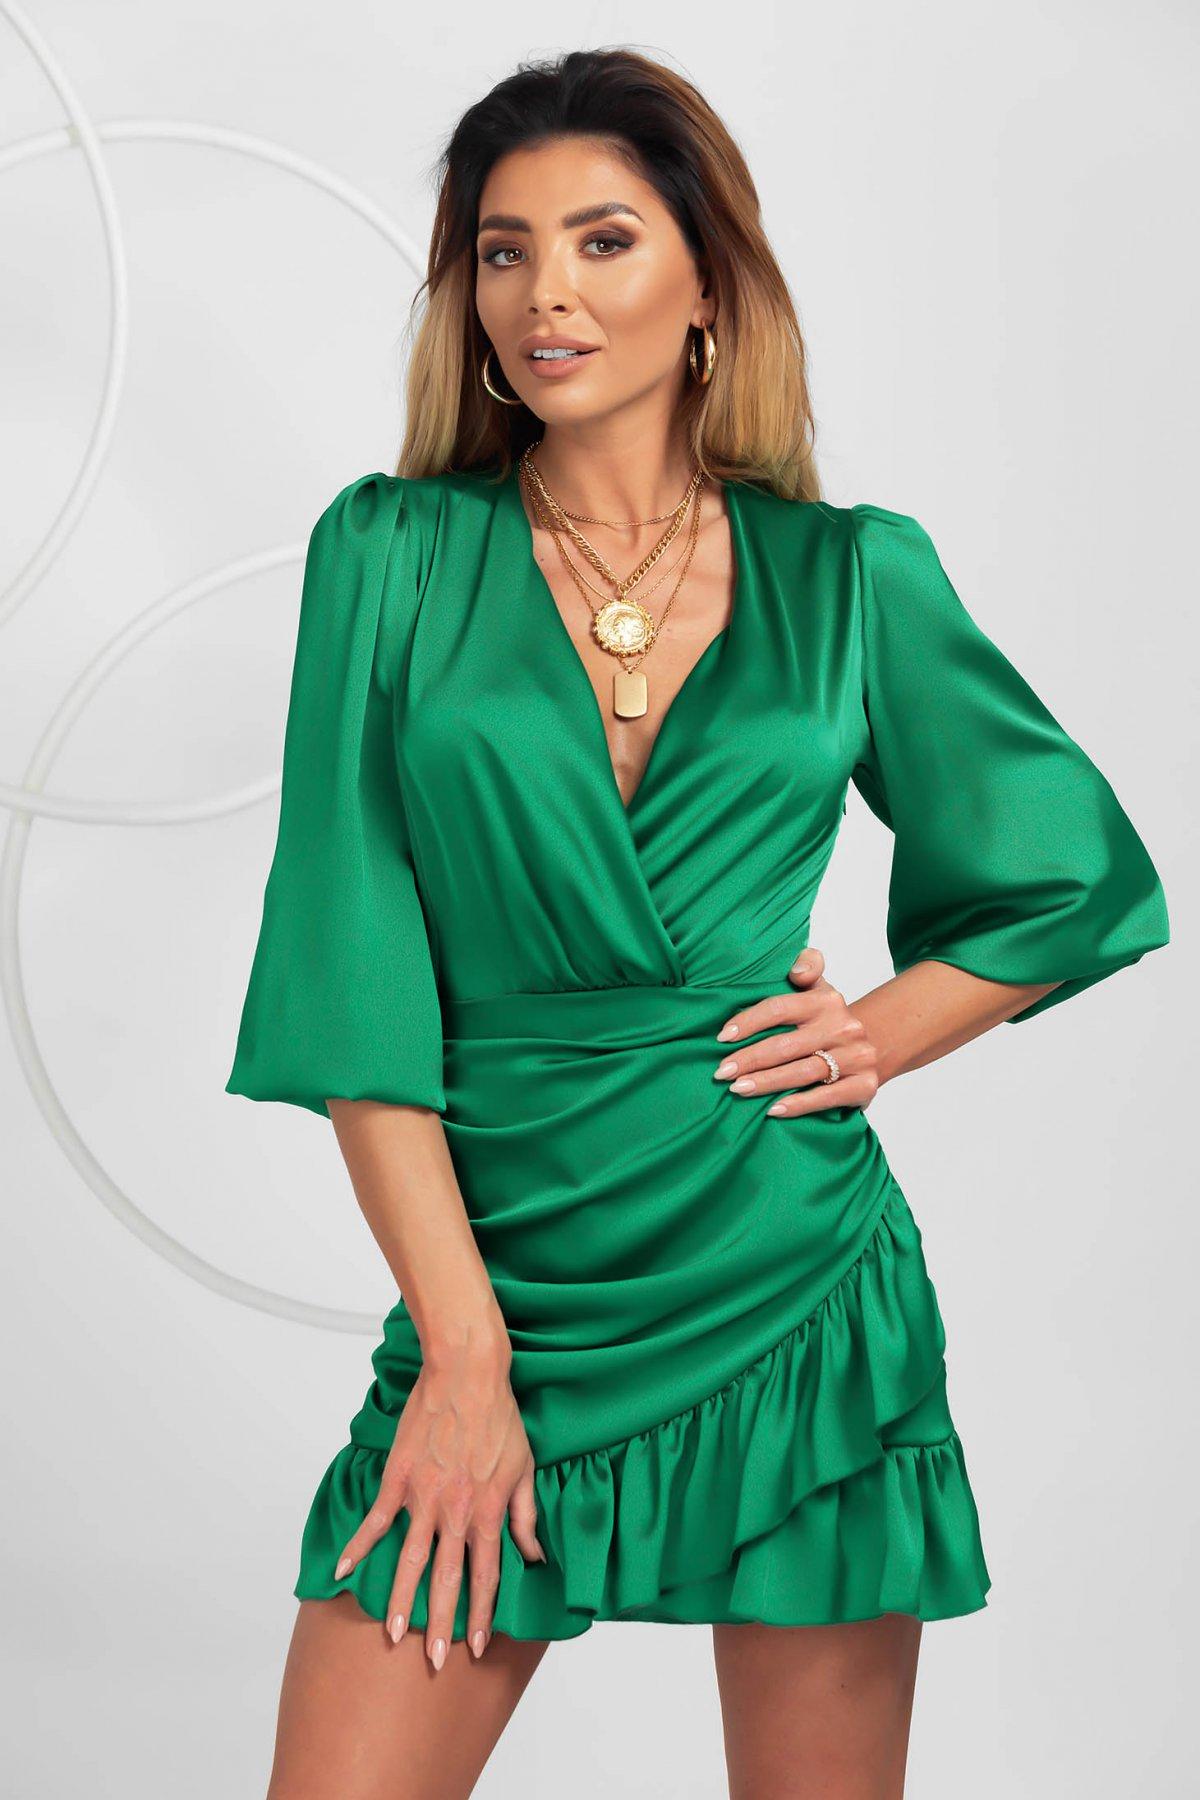 Rochie PrettyGirl verde de party din satin cu decolteu petrecut si volanase